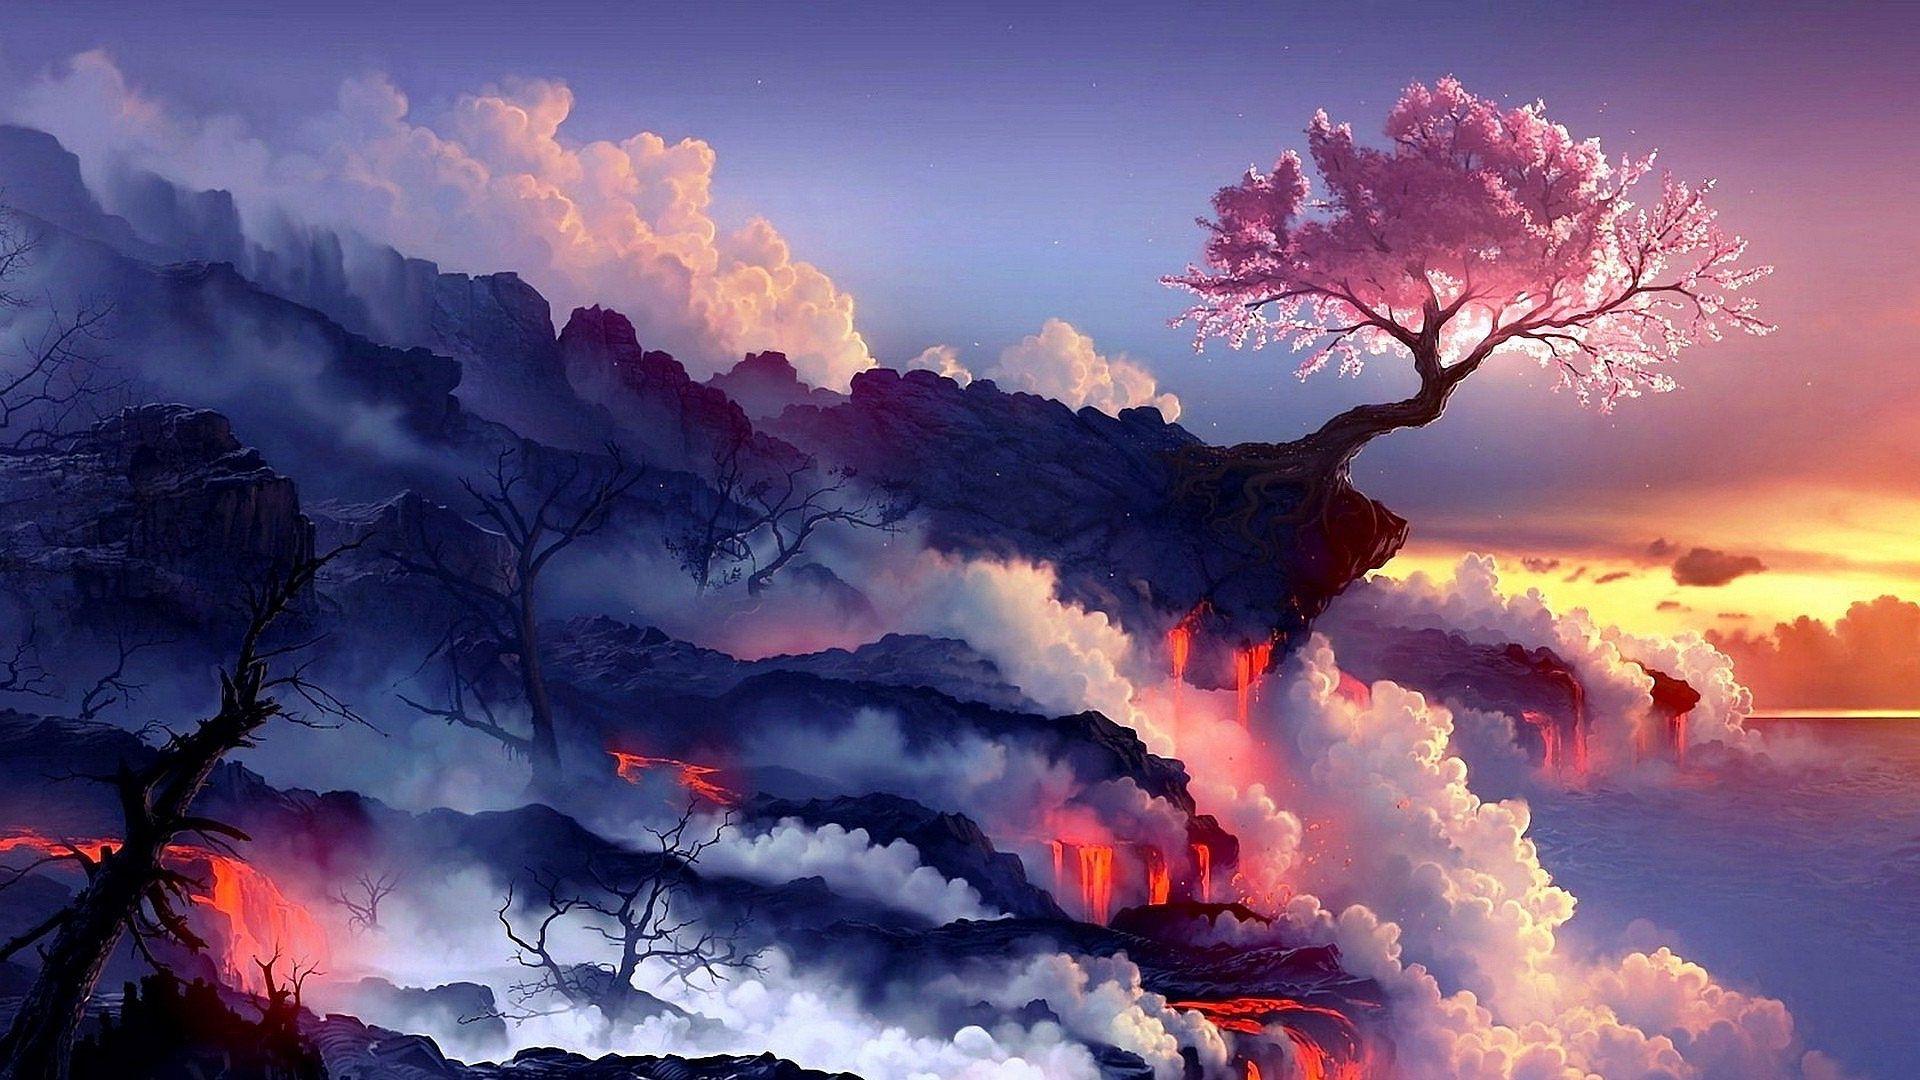 Cherry Tree Wallpaper Landscape Wallpaper Volcano Wallpaper Fantasy Landscape